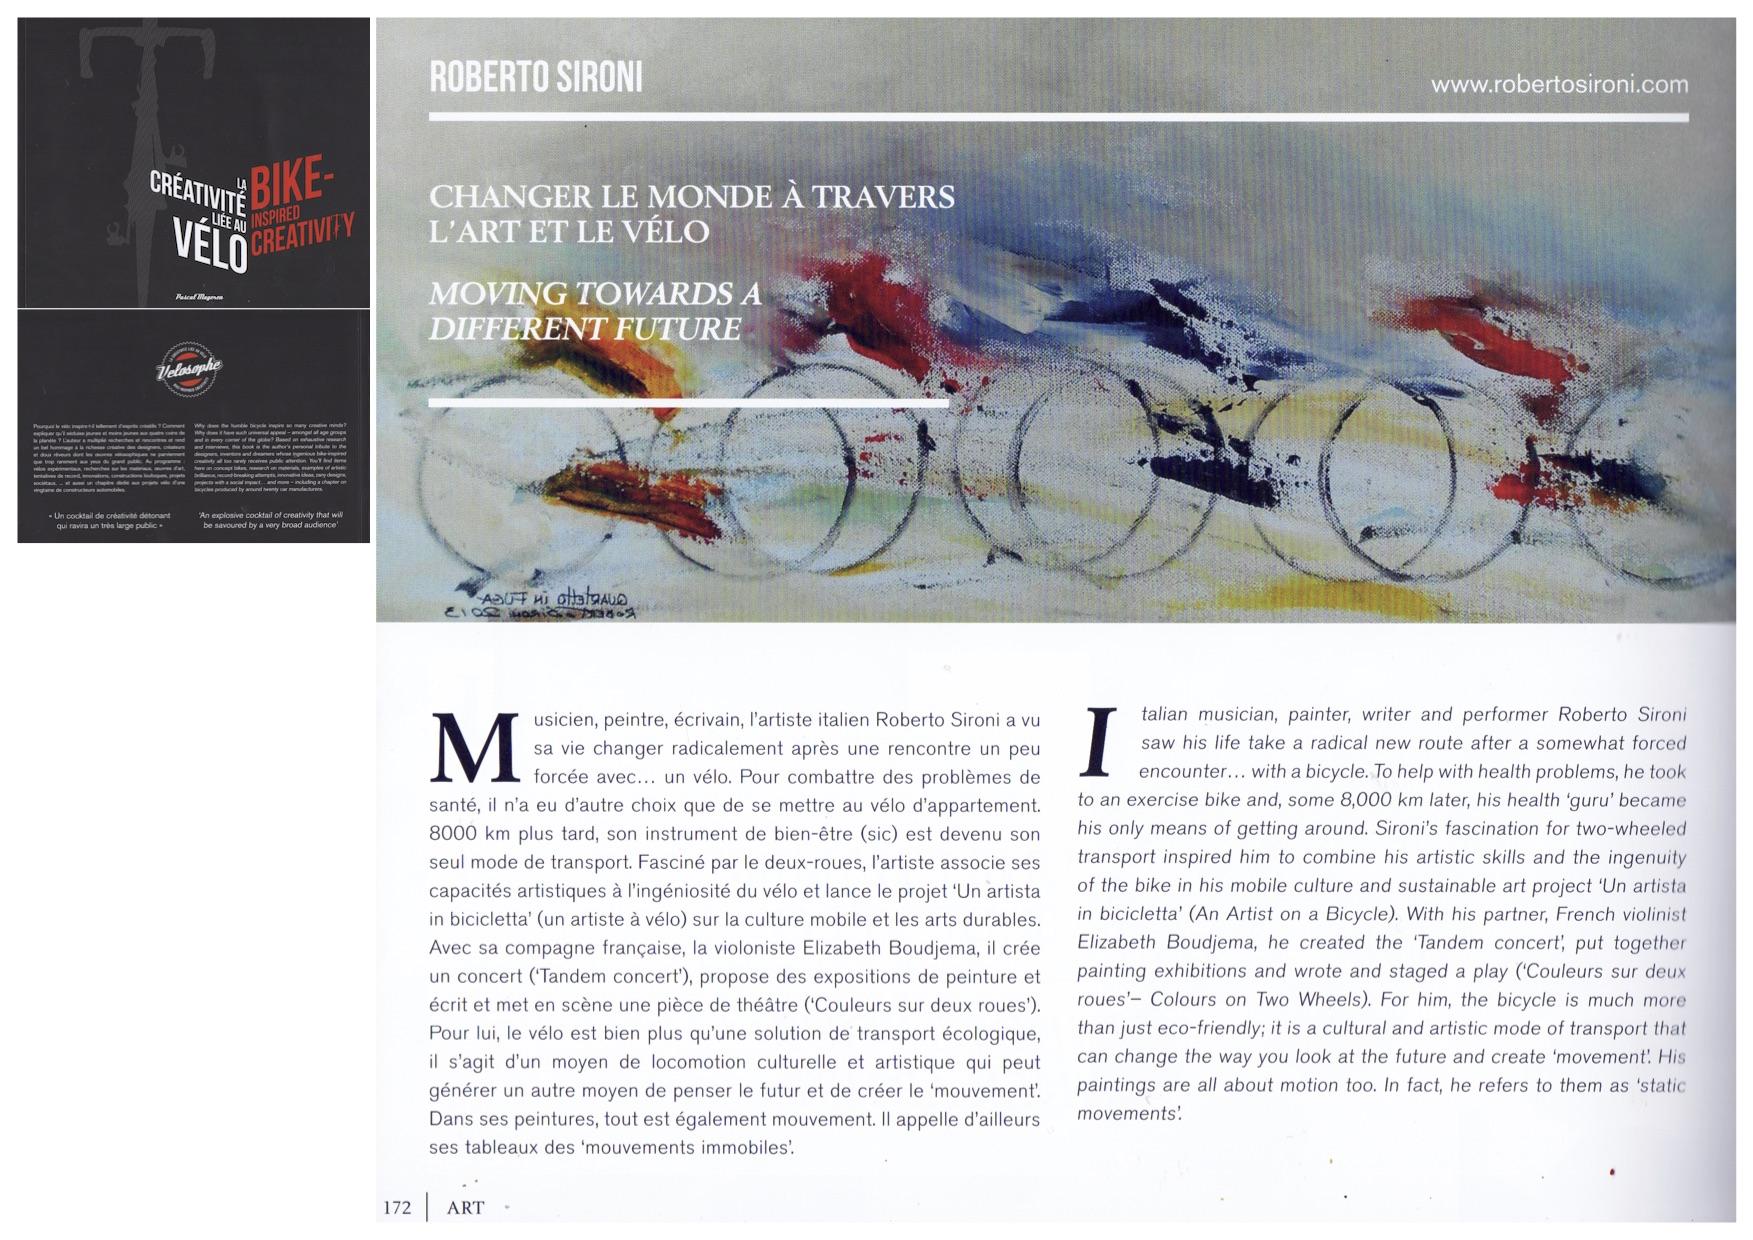 BIKE INSPIRED CREATIVITY - Pascal Margeren